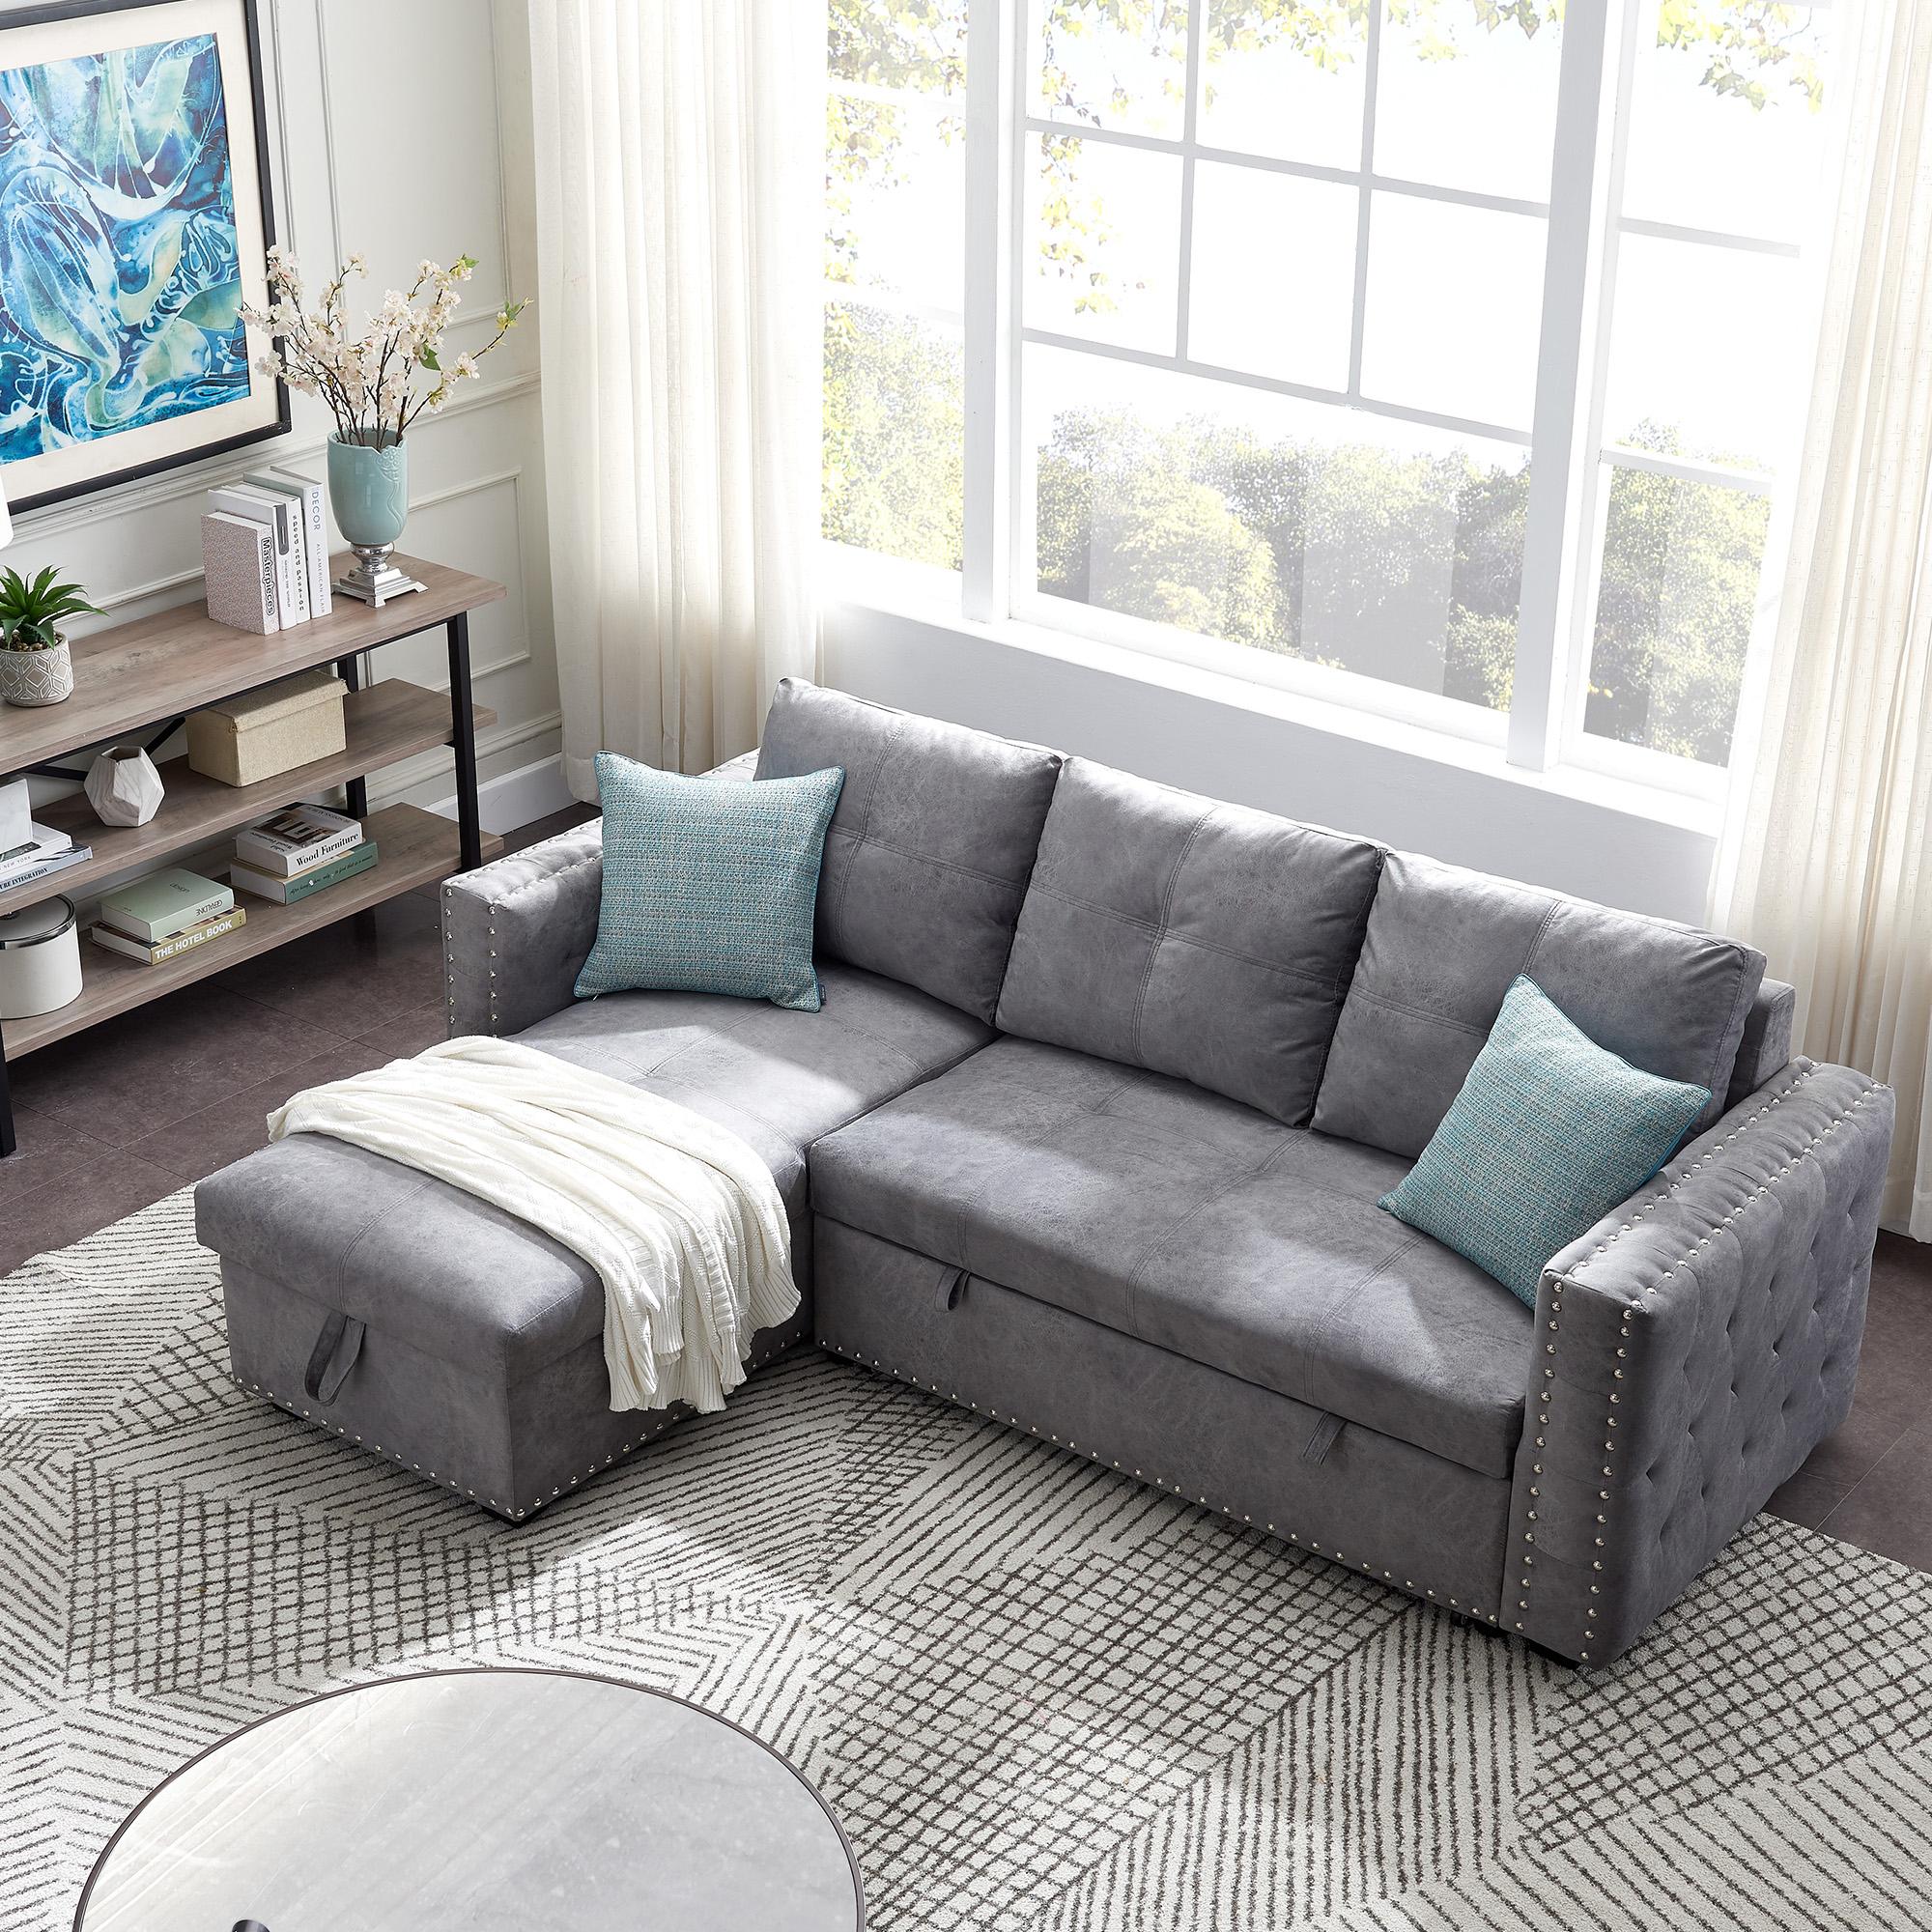 Segmart Sectional Sofa, Gray Fabric – Walmart Regarding Copenhagen Reversible Small Space Sectional Sofas With Storage (View 6 of 15)